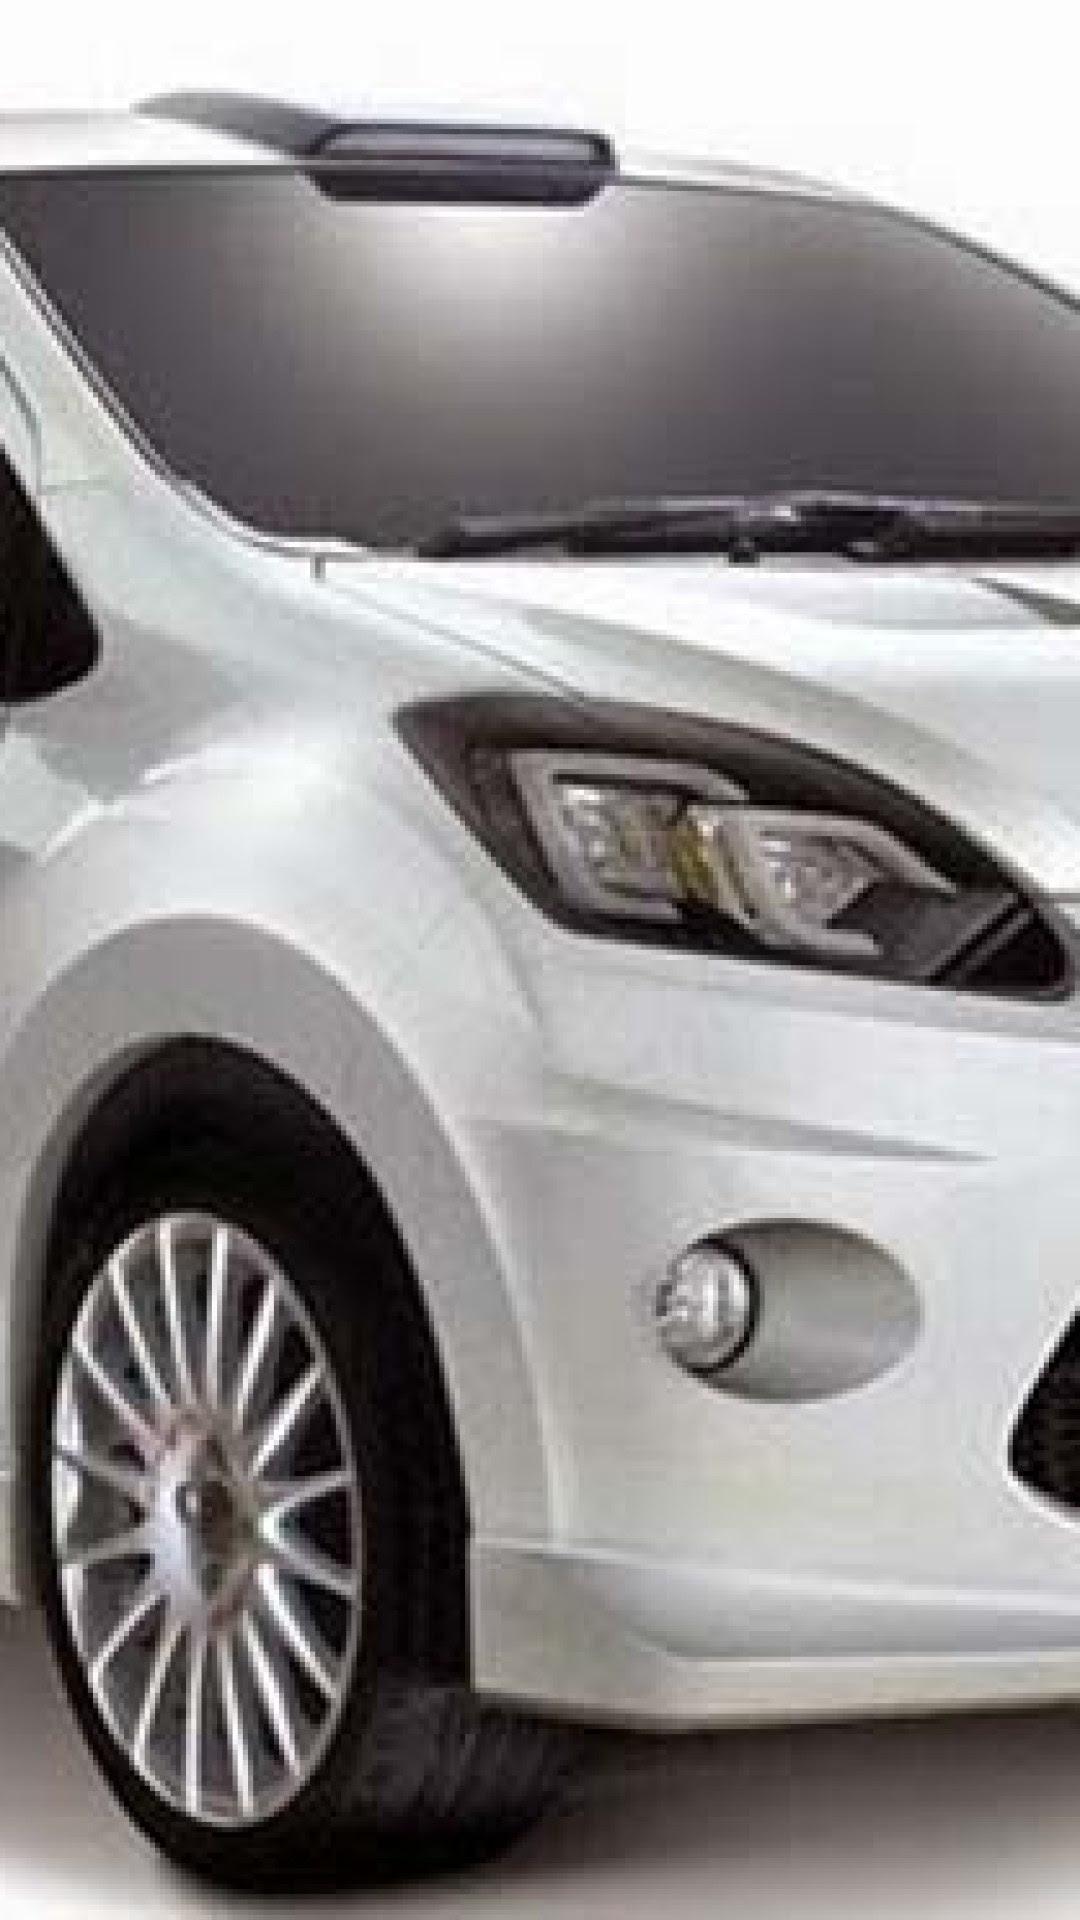 Kumpulan Modifikasi Mobil Agya Tipe E Terbaru Rekanotomotif